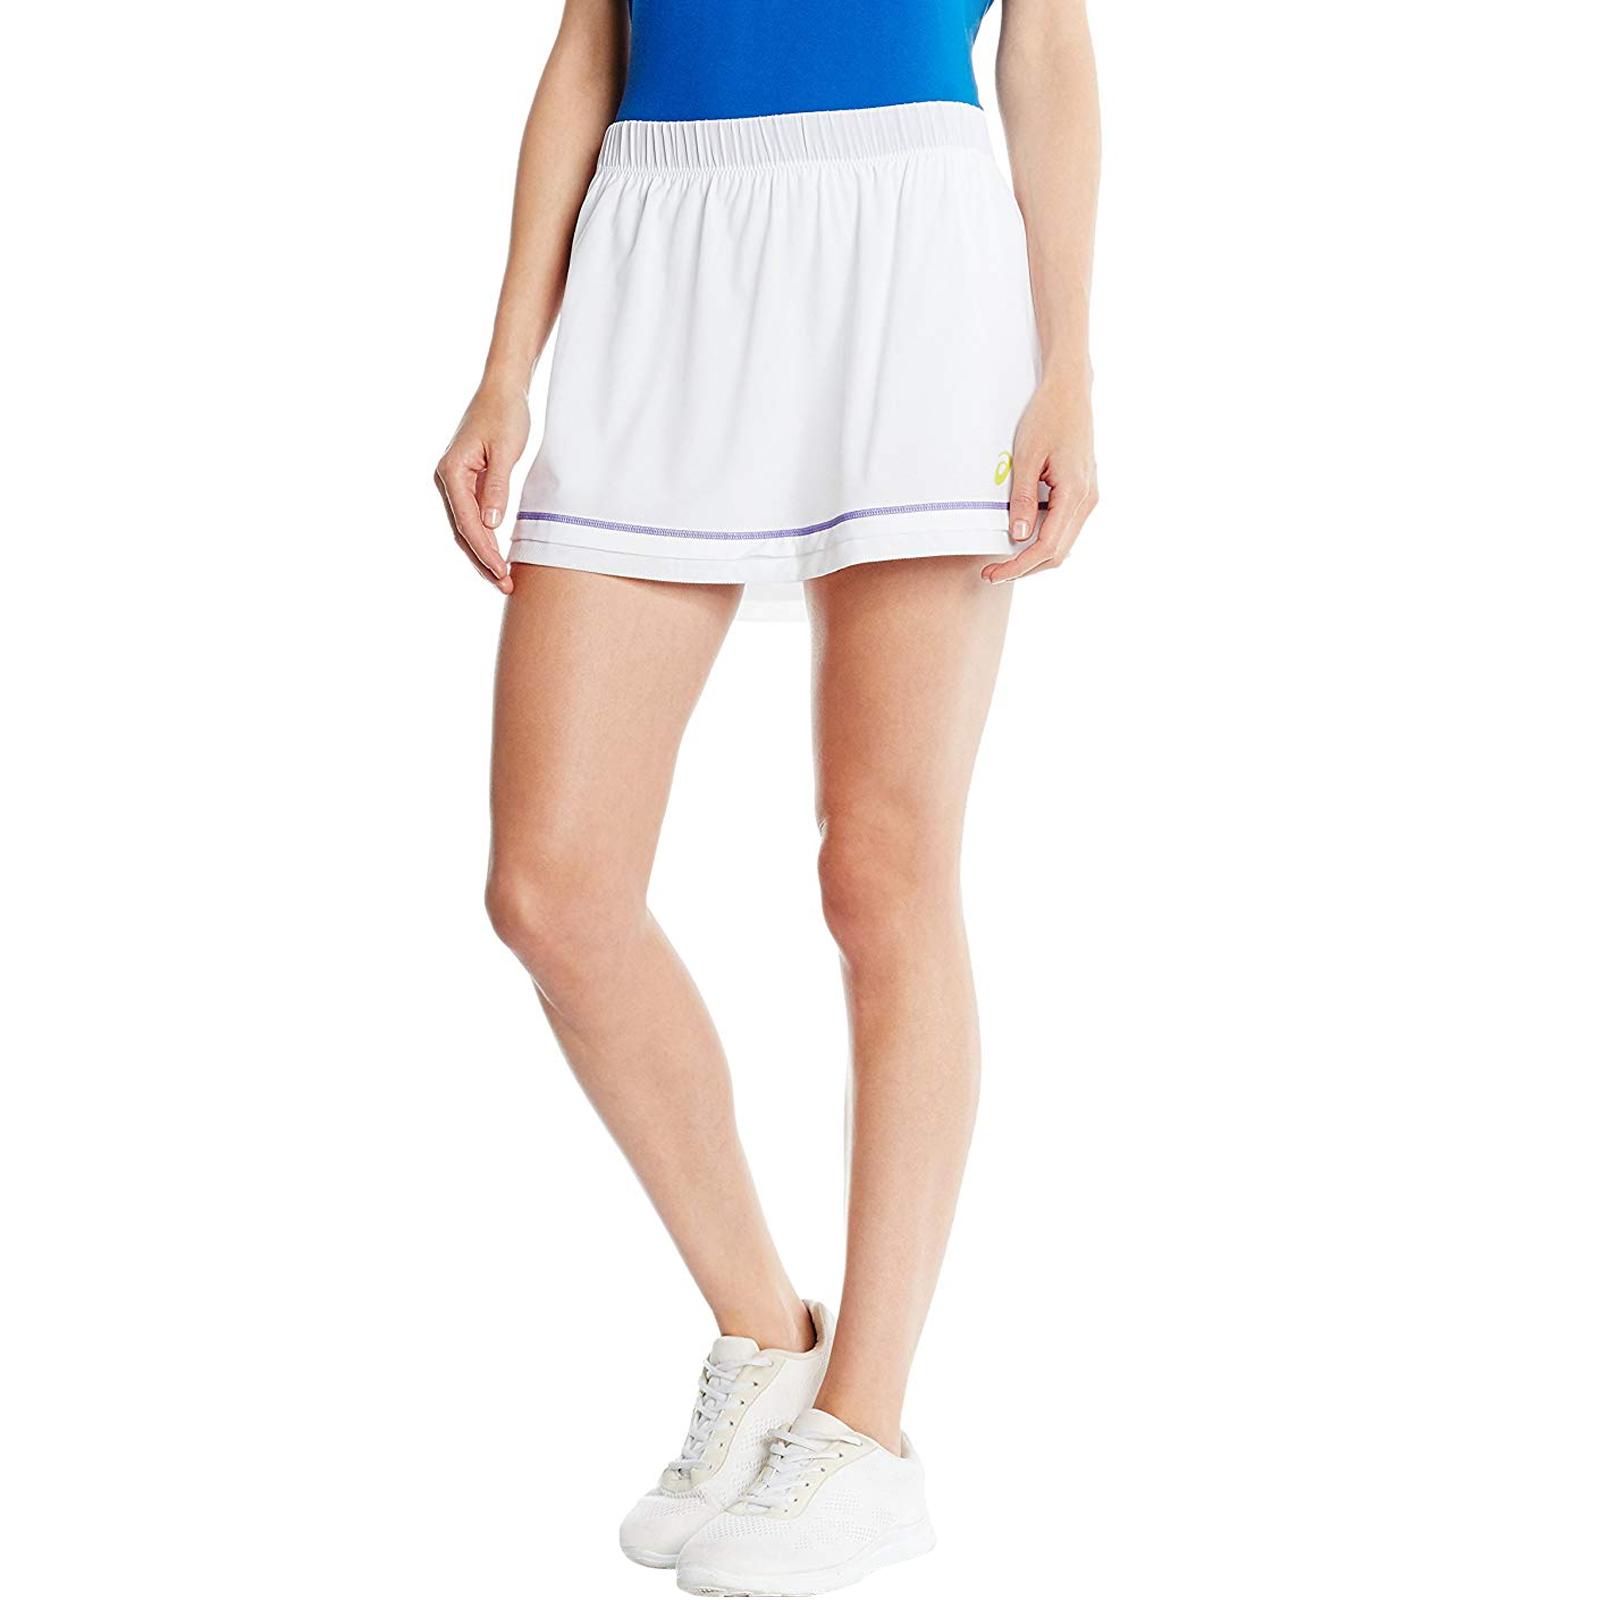 Ingegnoso Asics Da Donna Vantaggio Sports Tennis Addestramento Motiondry Gonna Pantaloncini Skort-bianco- Altamente Lucido